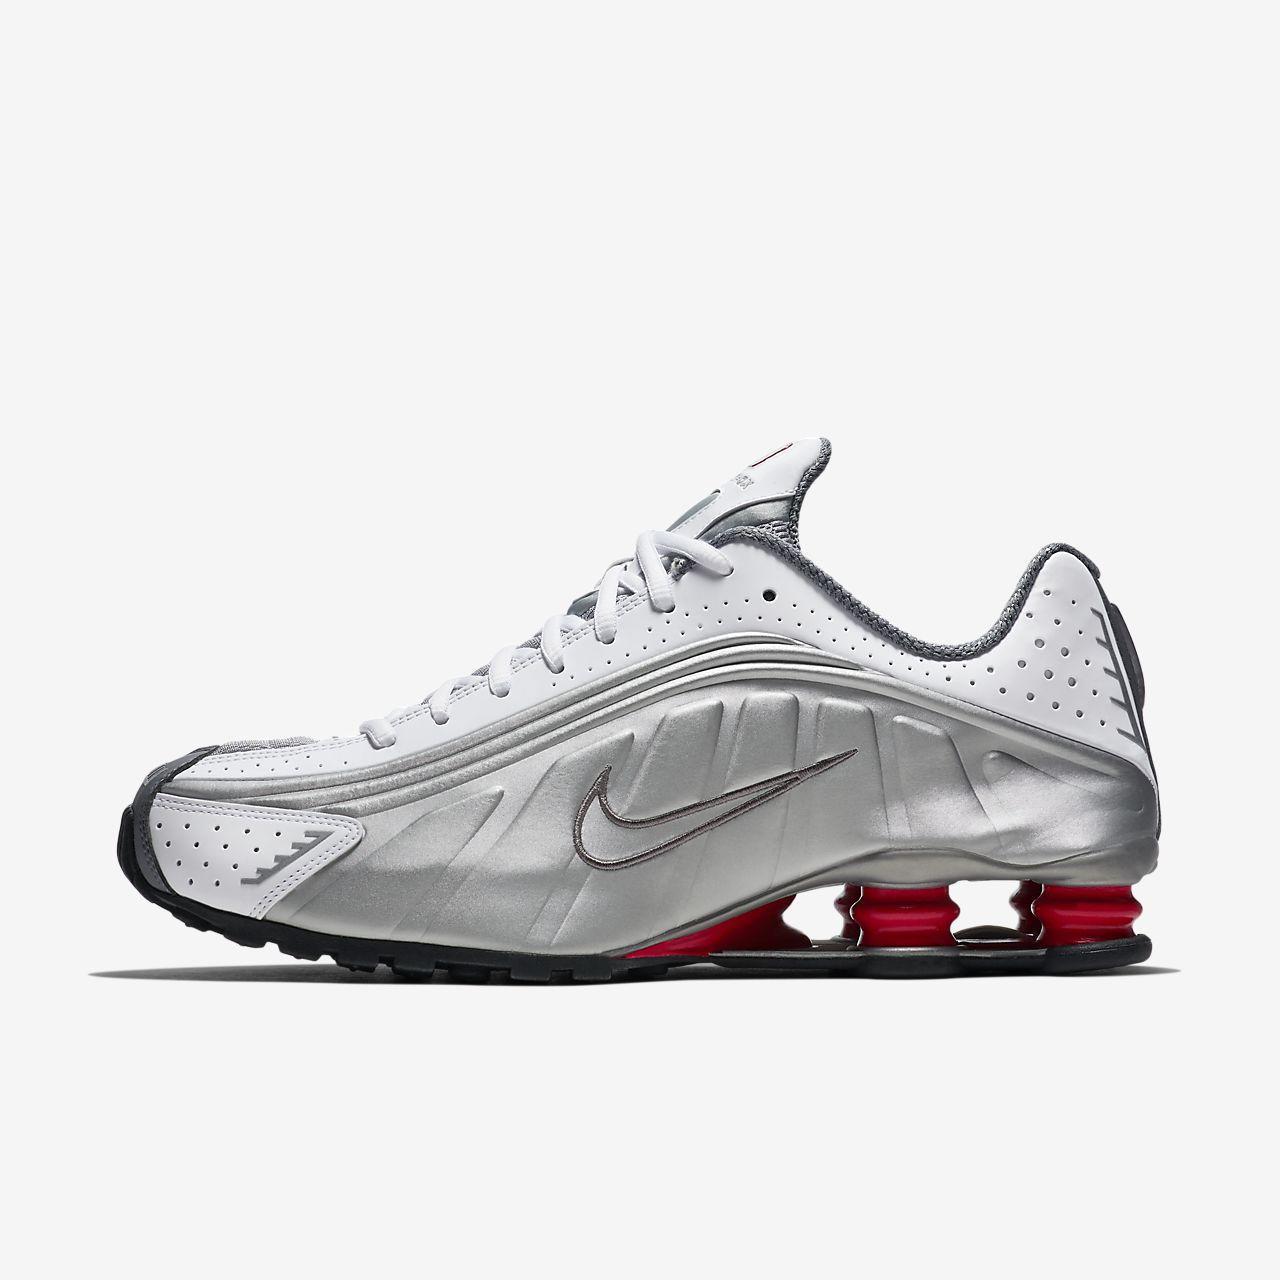 low priced a0447 d05a3 Low Resolution Nike Shox R4 Shoe Nike Shox R4 Shoe